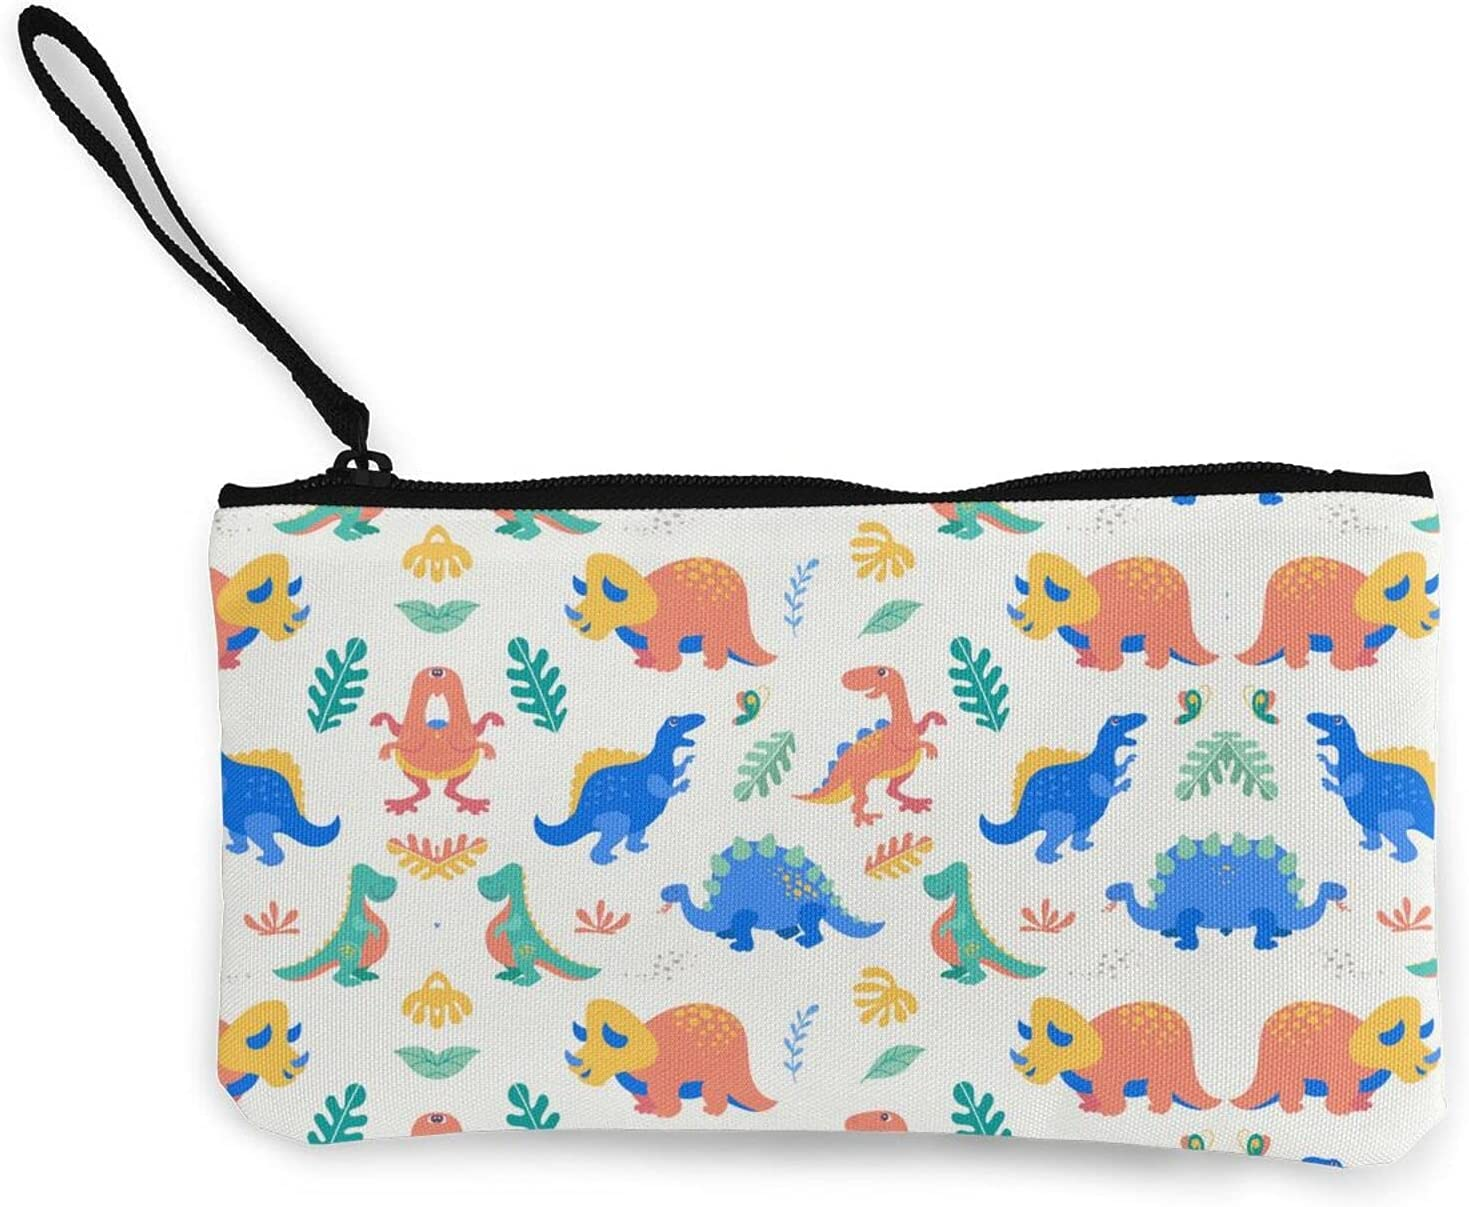 Cute Dinosaur Pattern Dino Print Zipper Pouch/ Canvas Coin Purse Wallet/ Cute Mini Change Wallet For Women/ Pouch Card Holder Phone Storage Bag